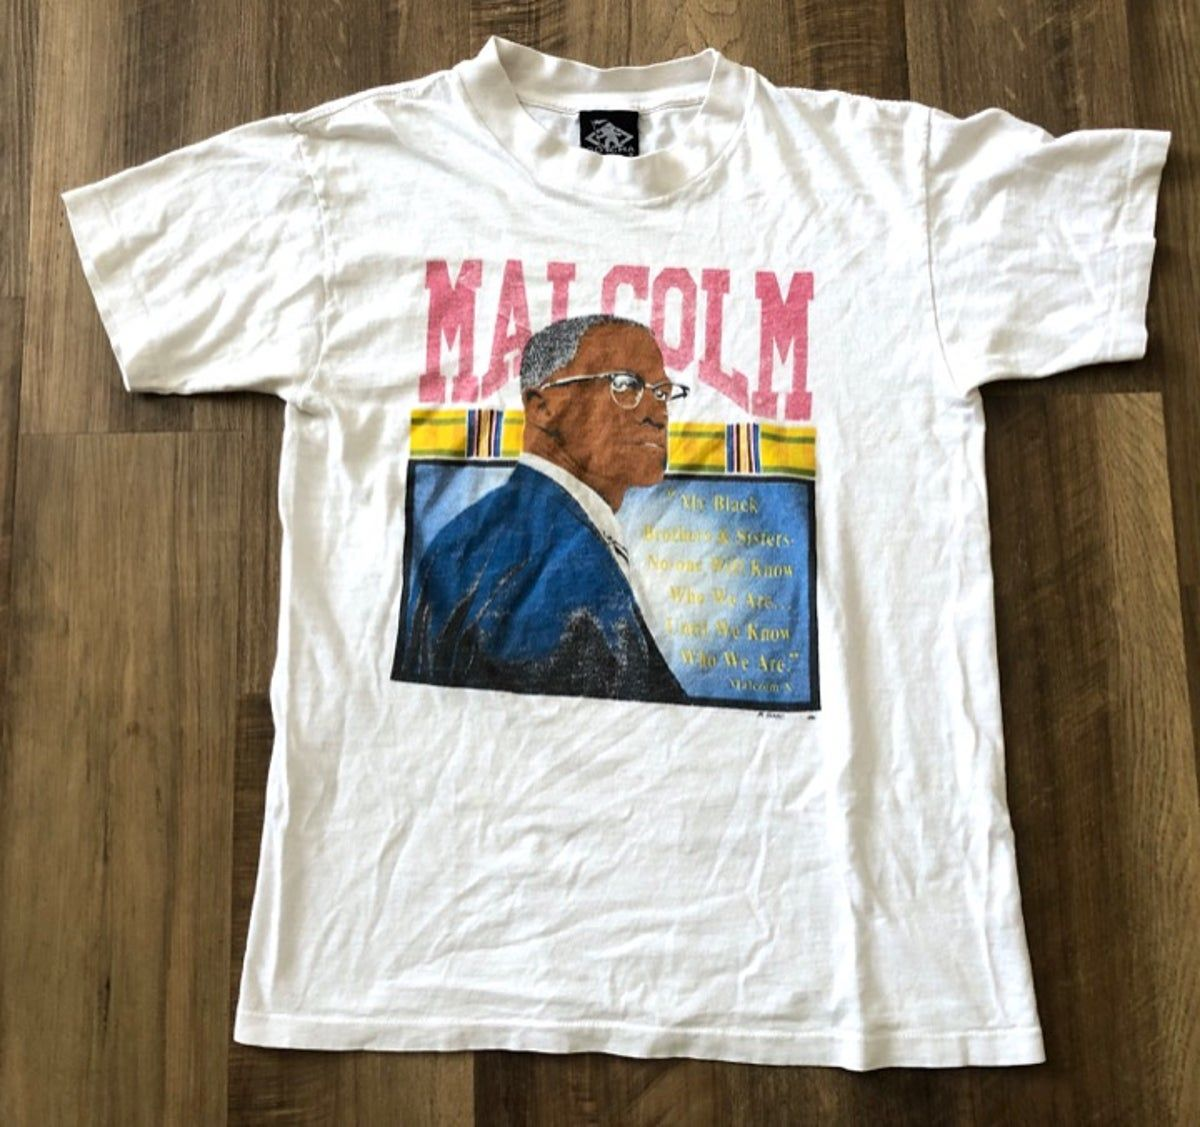 Vintage 90s Malcolm X T Shirt Gotcha S In 2020 Vintage Shirts T Shirt